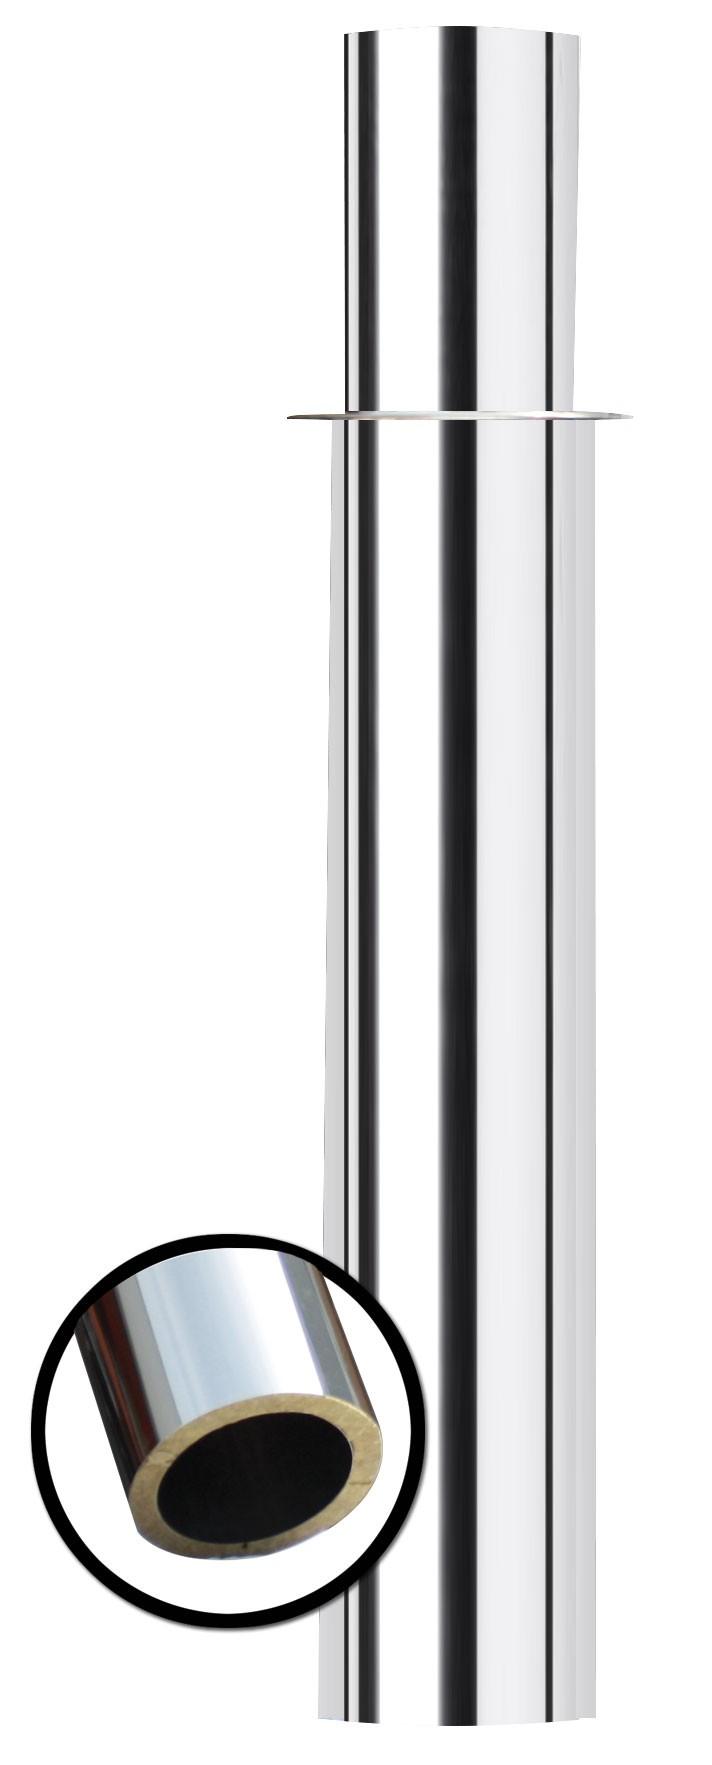 Verlängerungselement Edelstahl ohne Windkat 500 mm Ø 150 mm Bild 1